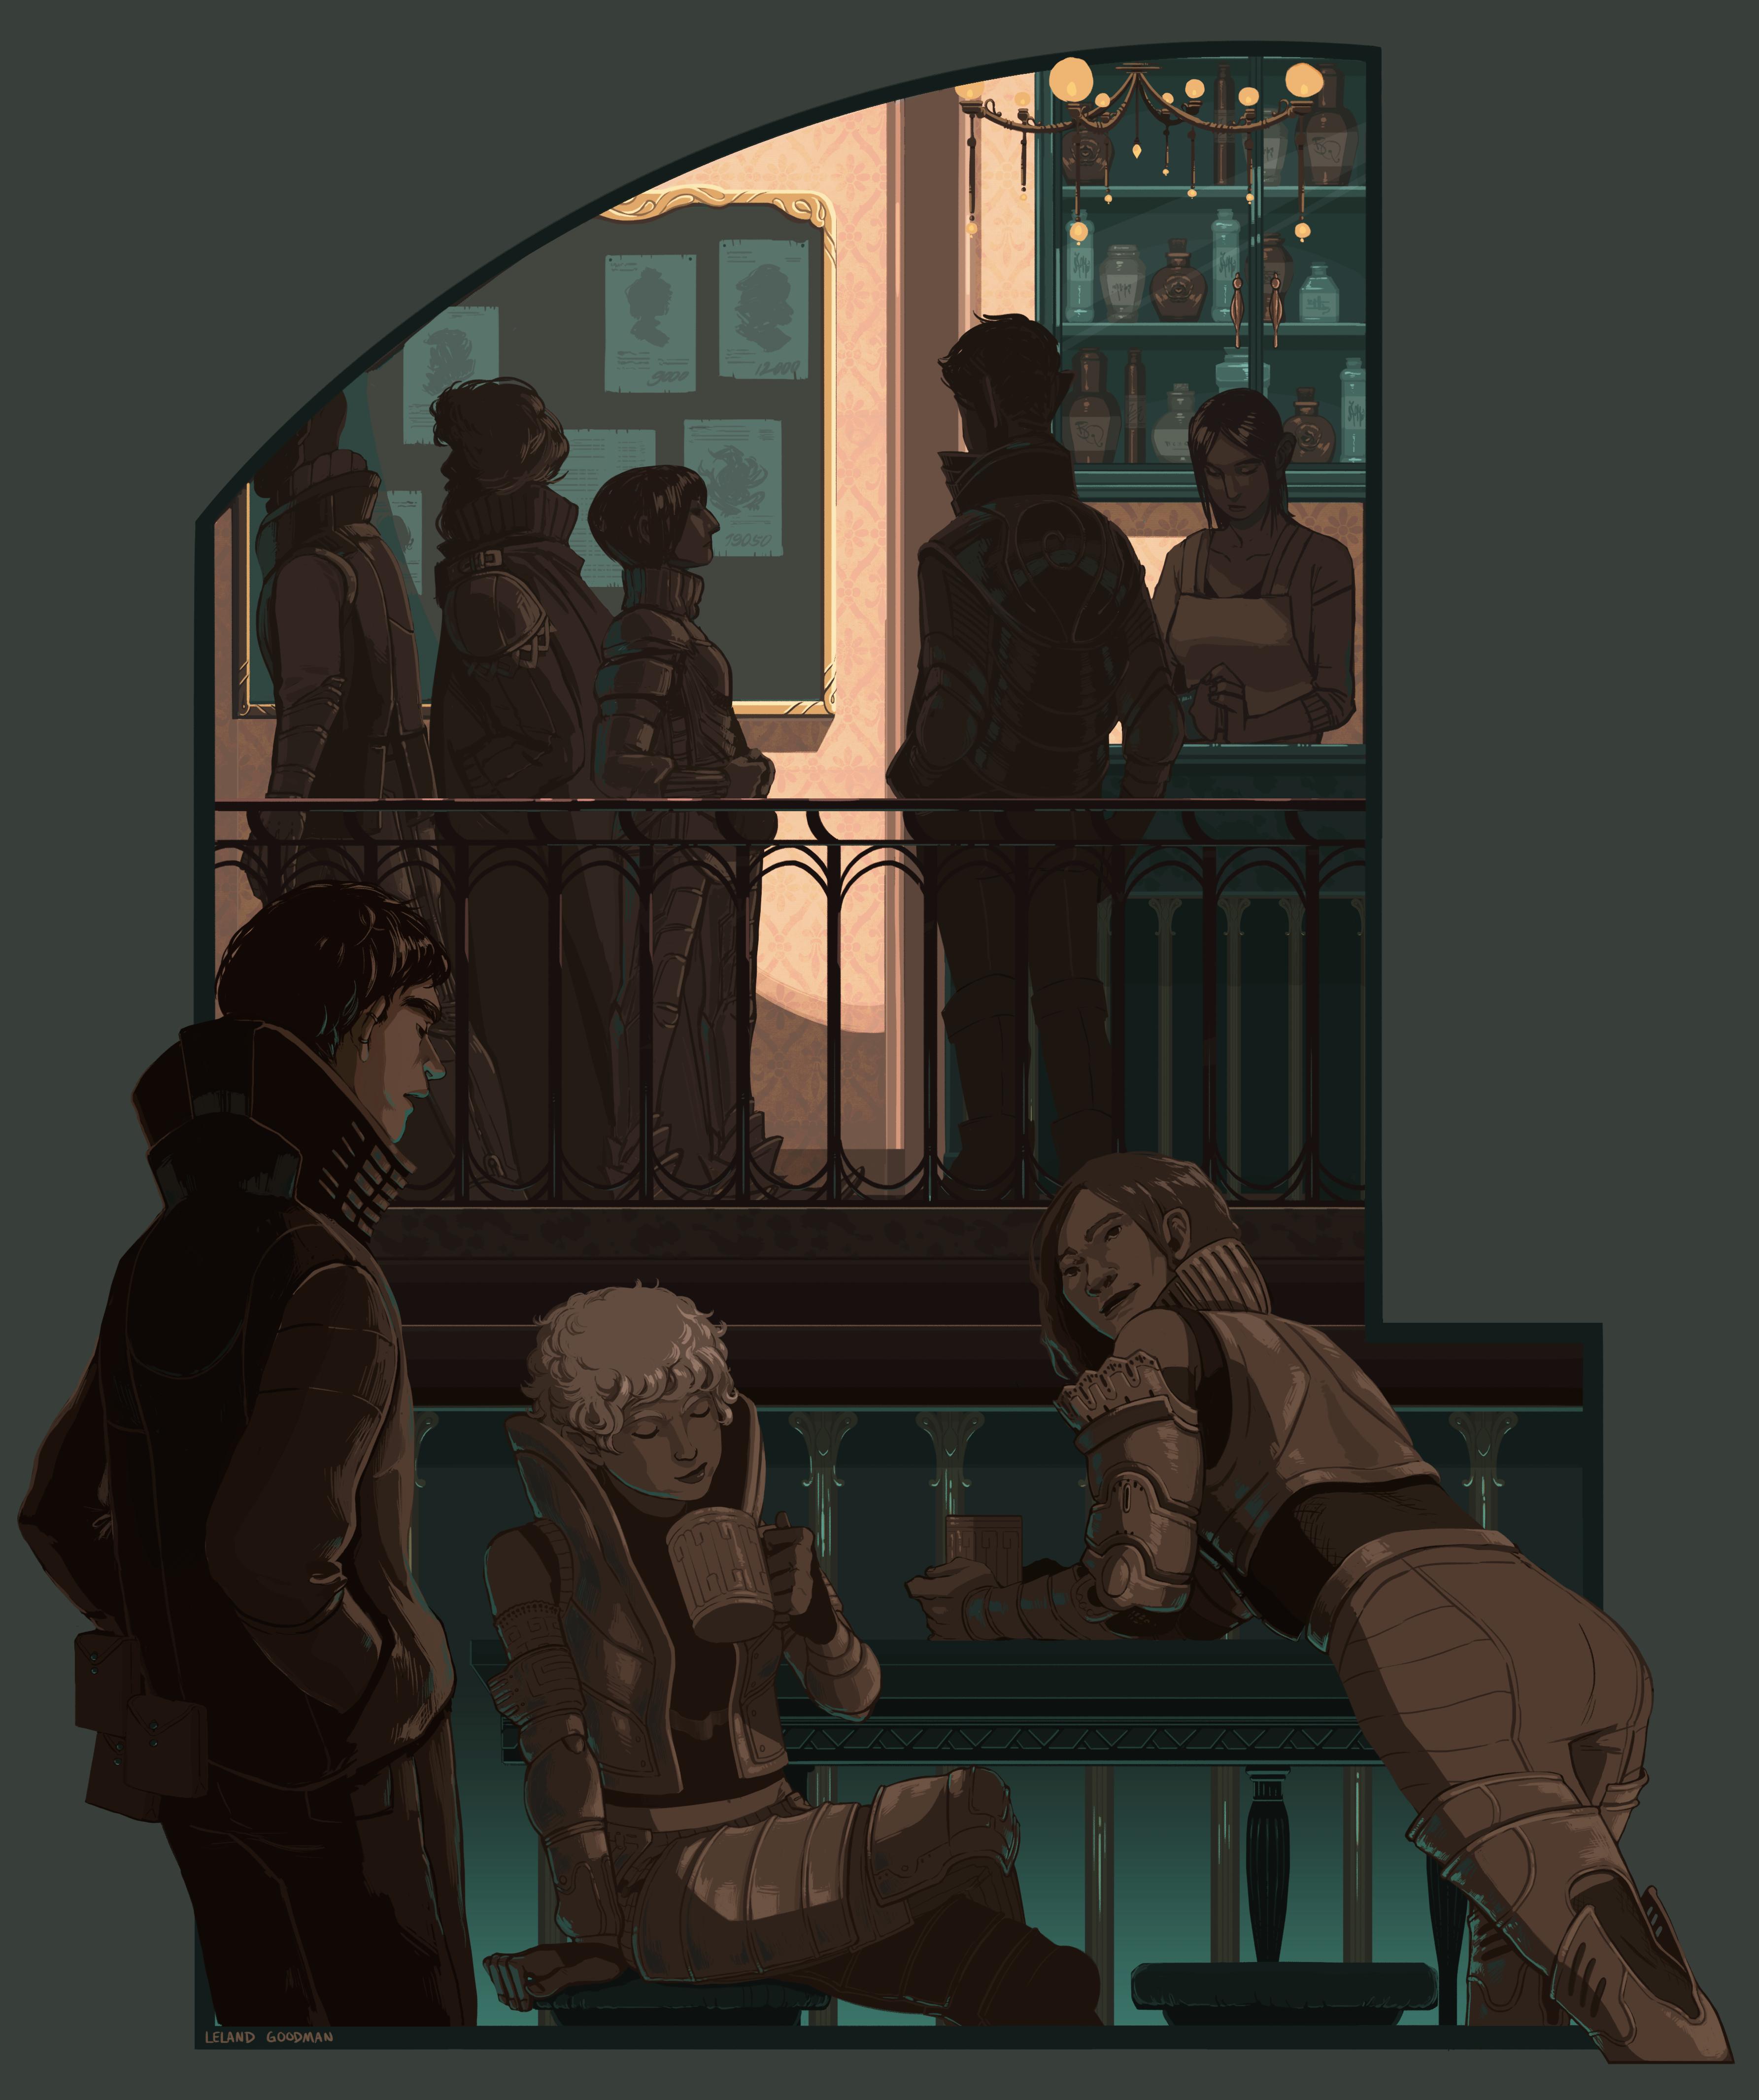 High class tavern